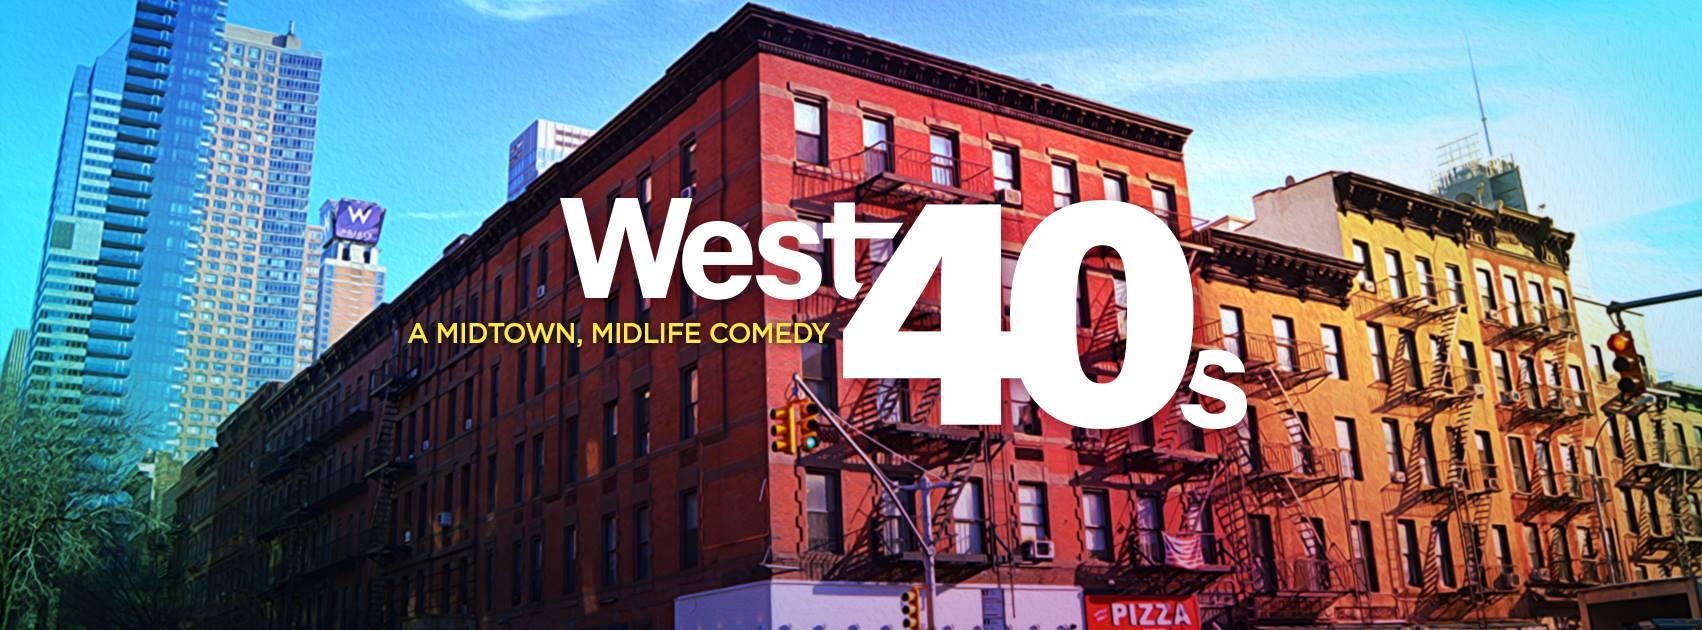 West 40s